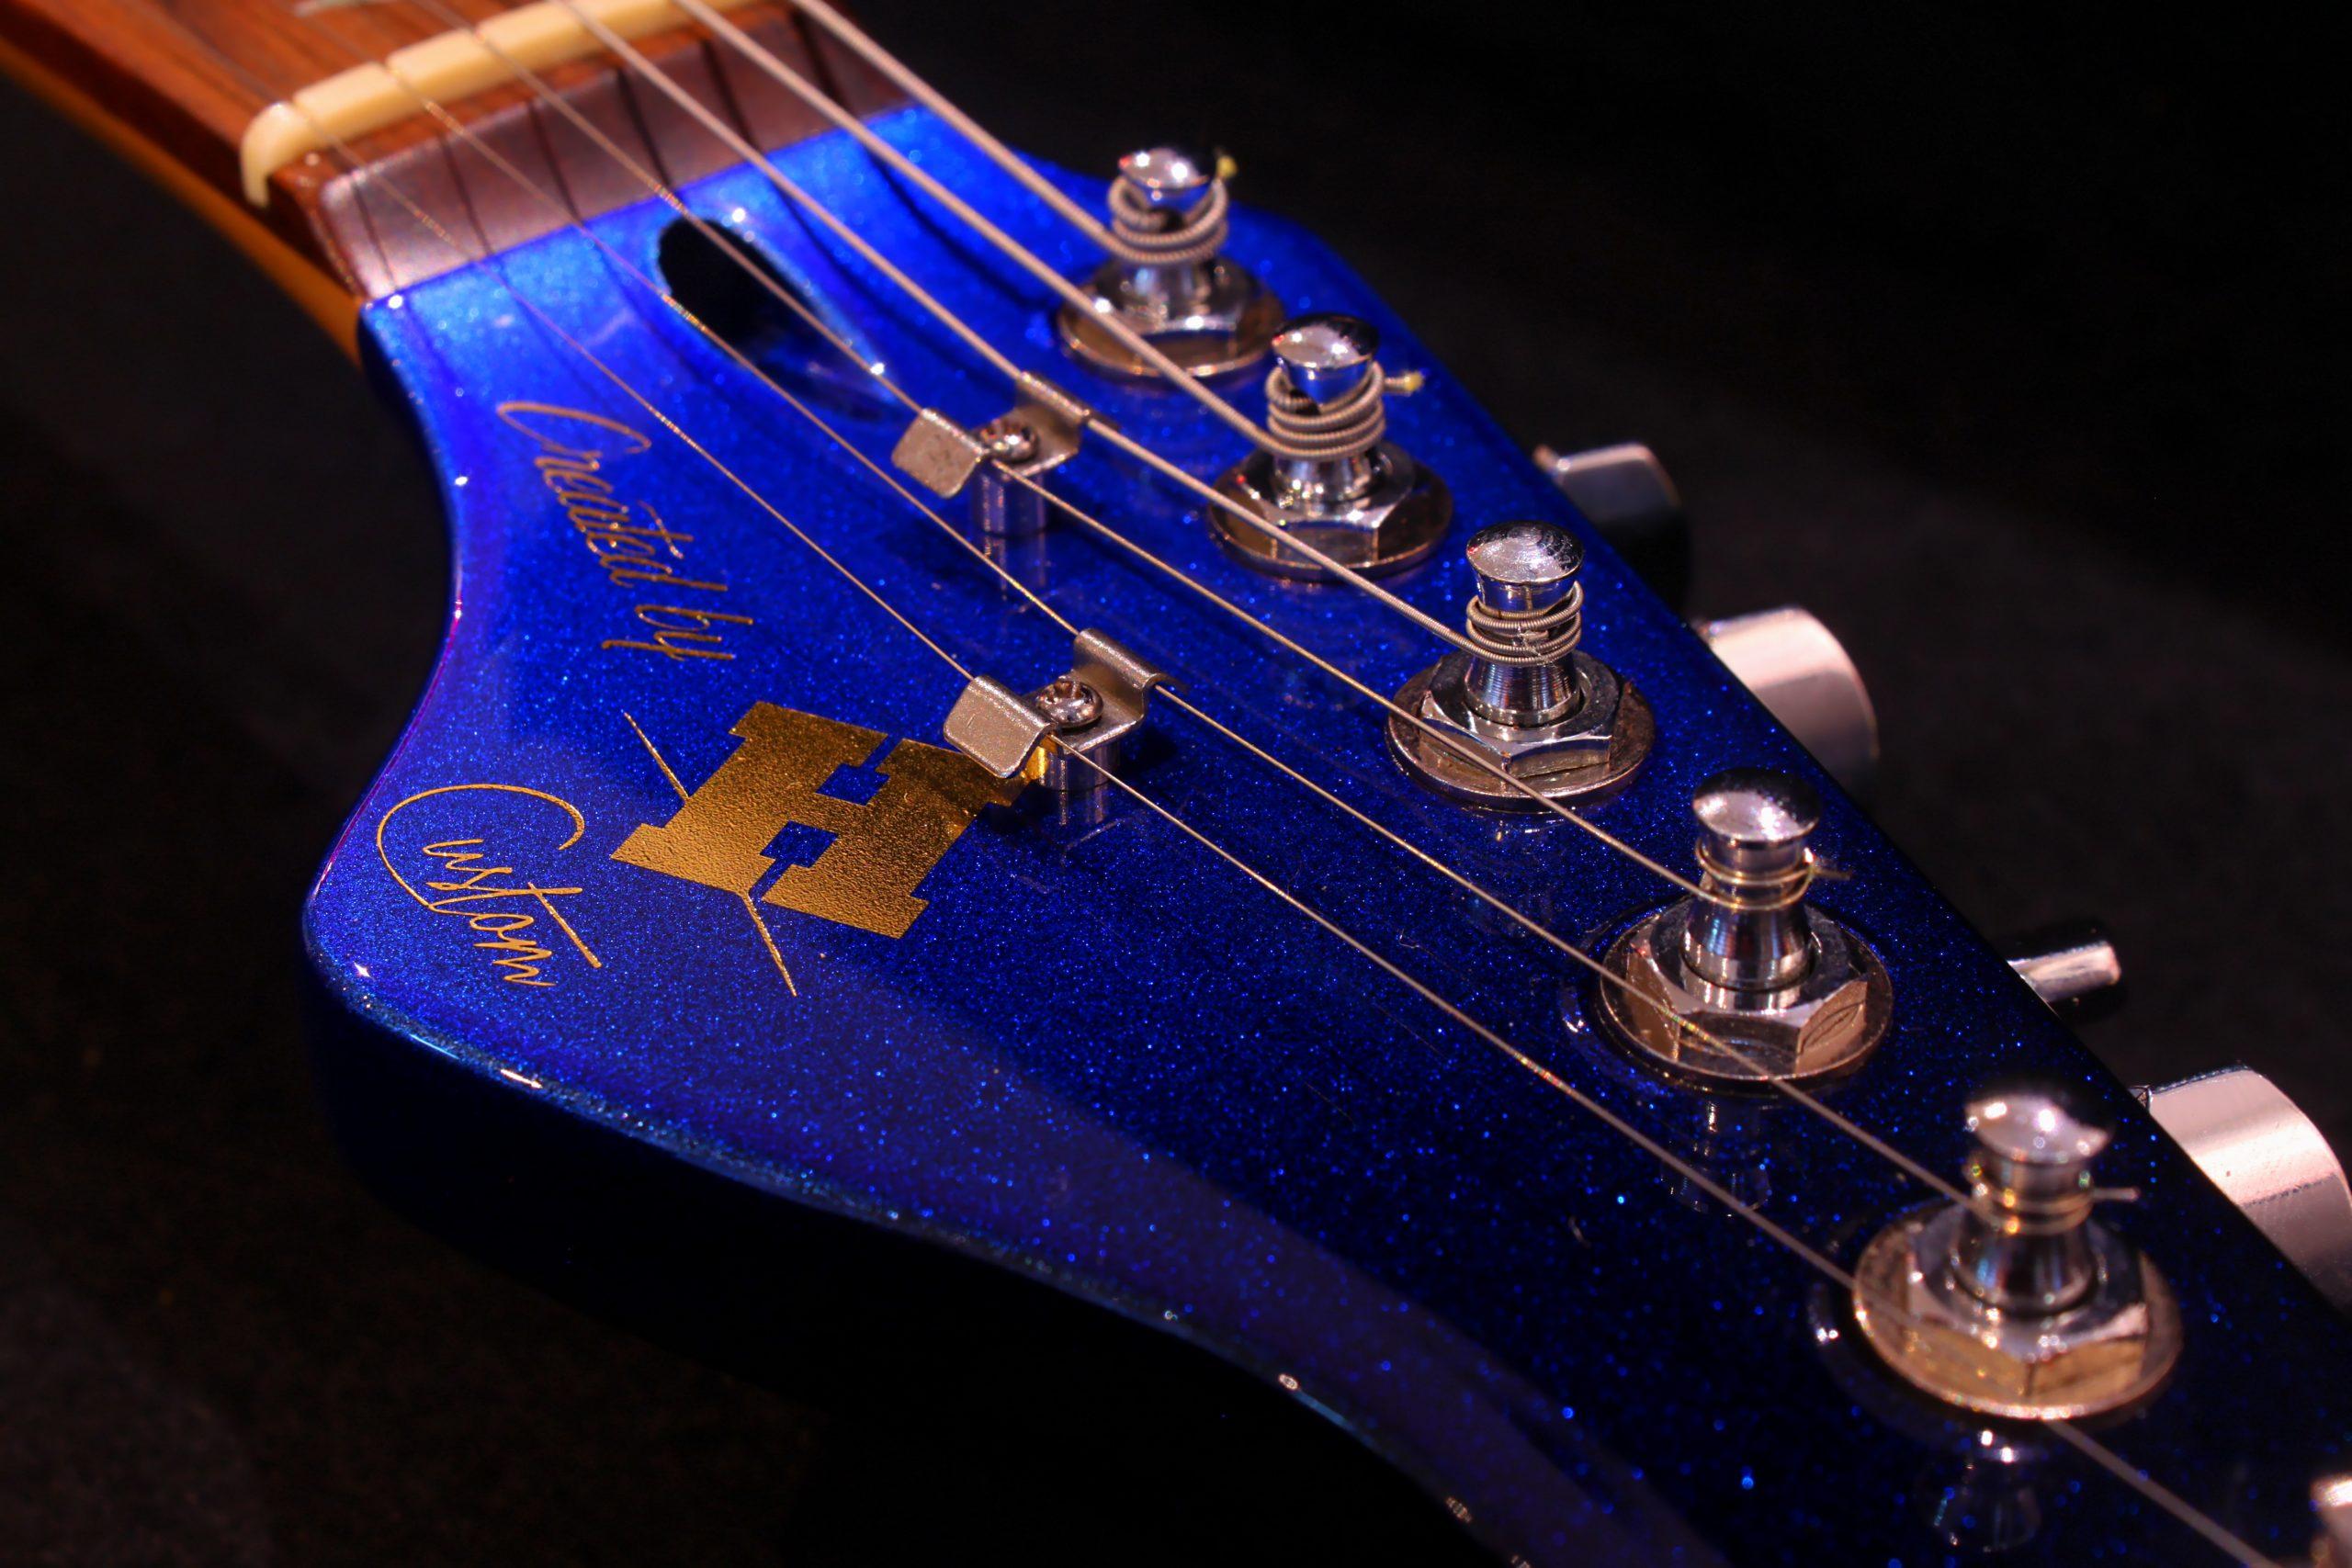 Stratocaster fumée bleu & carbone